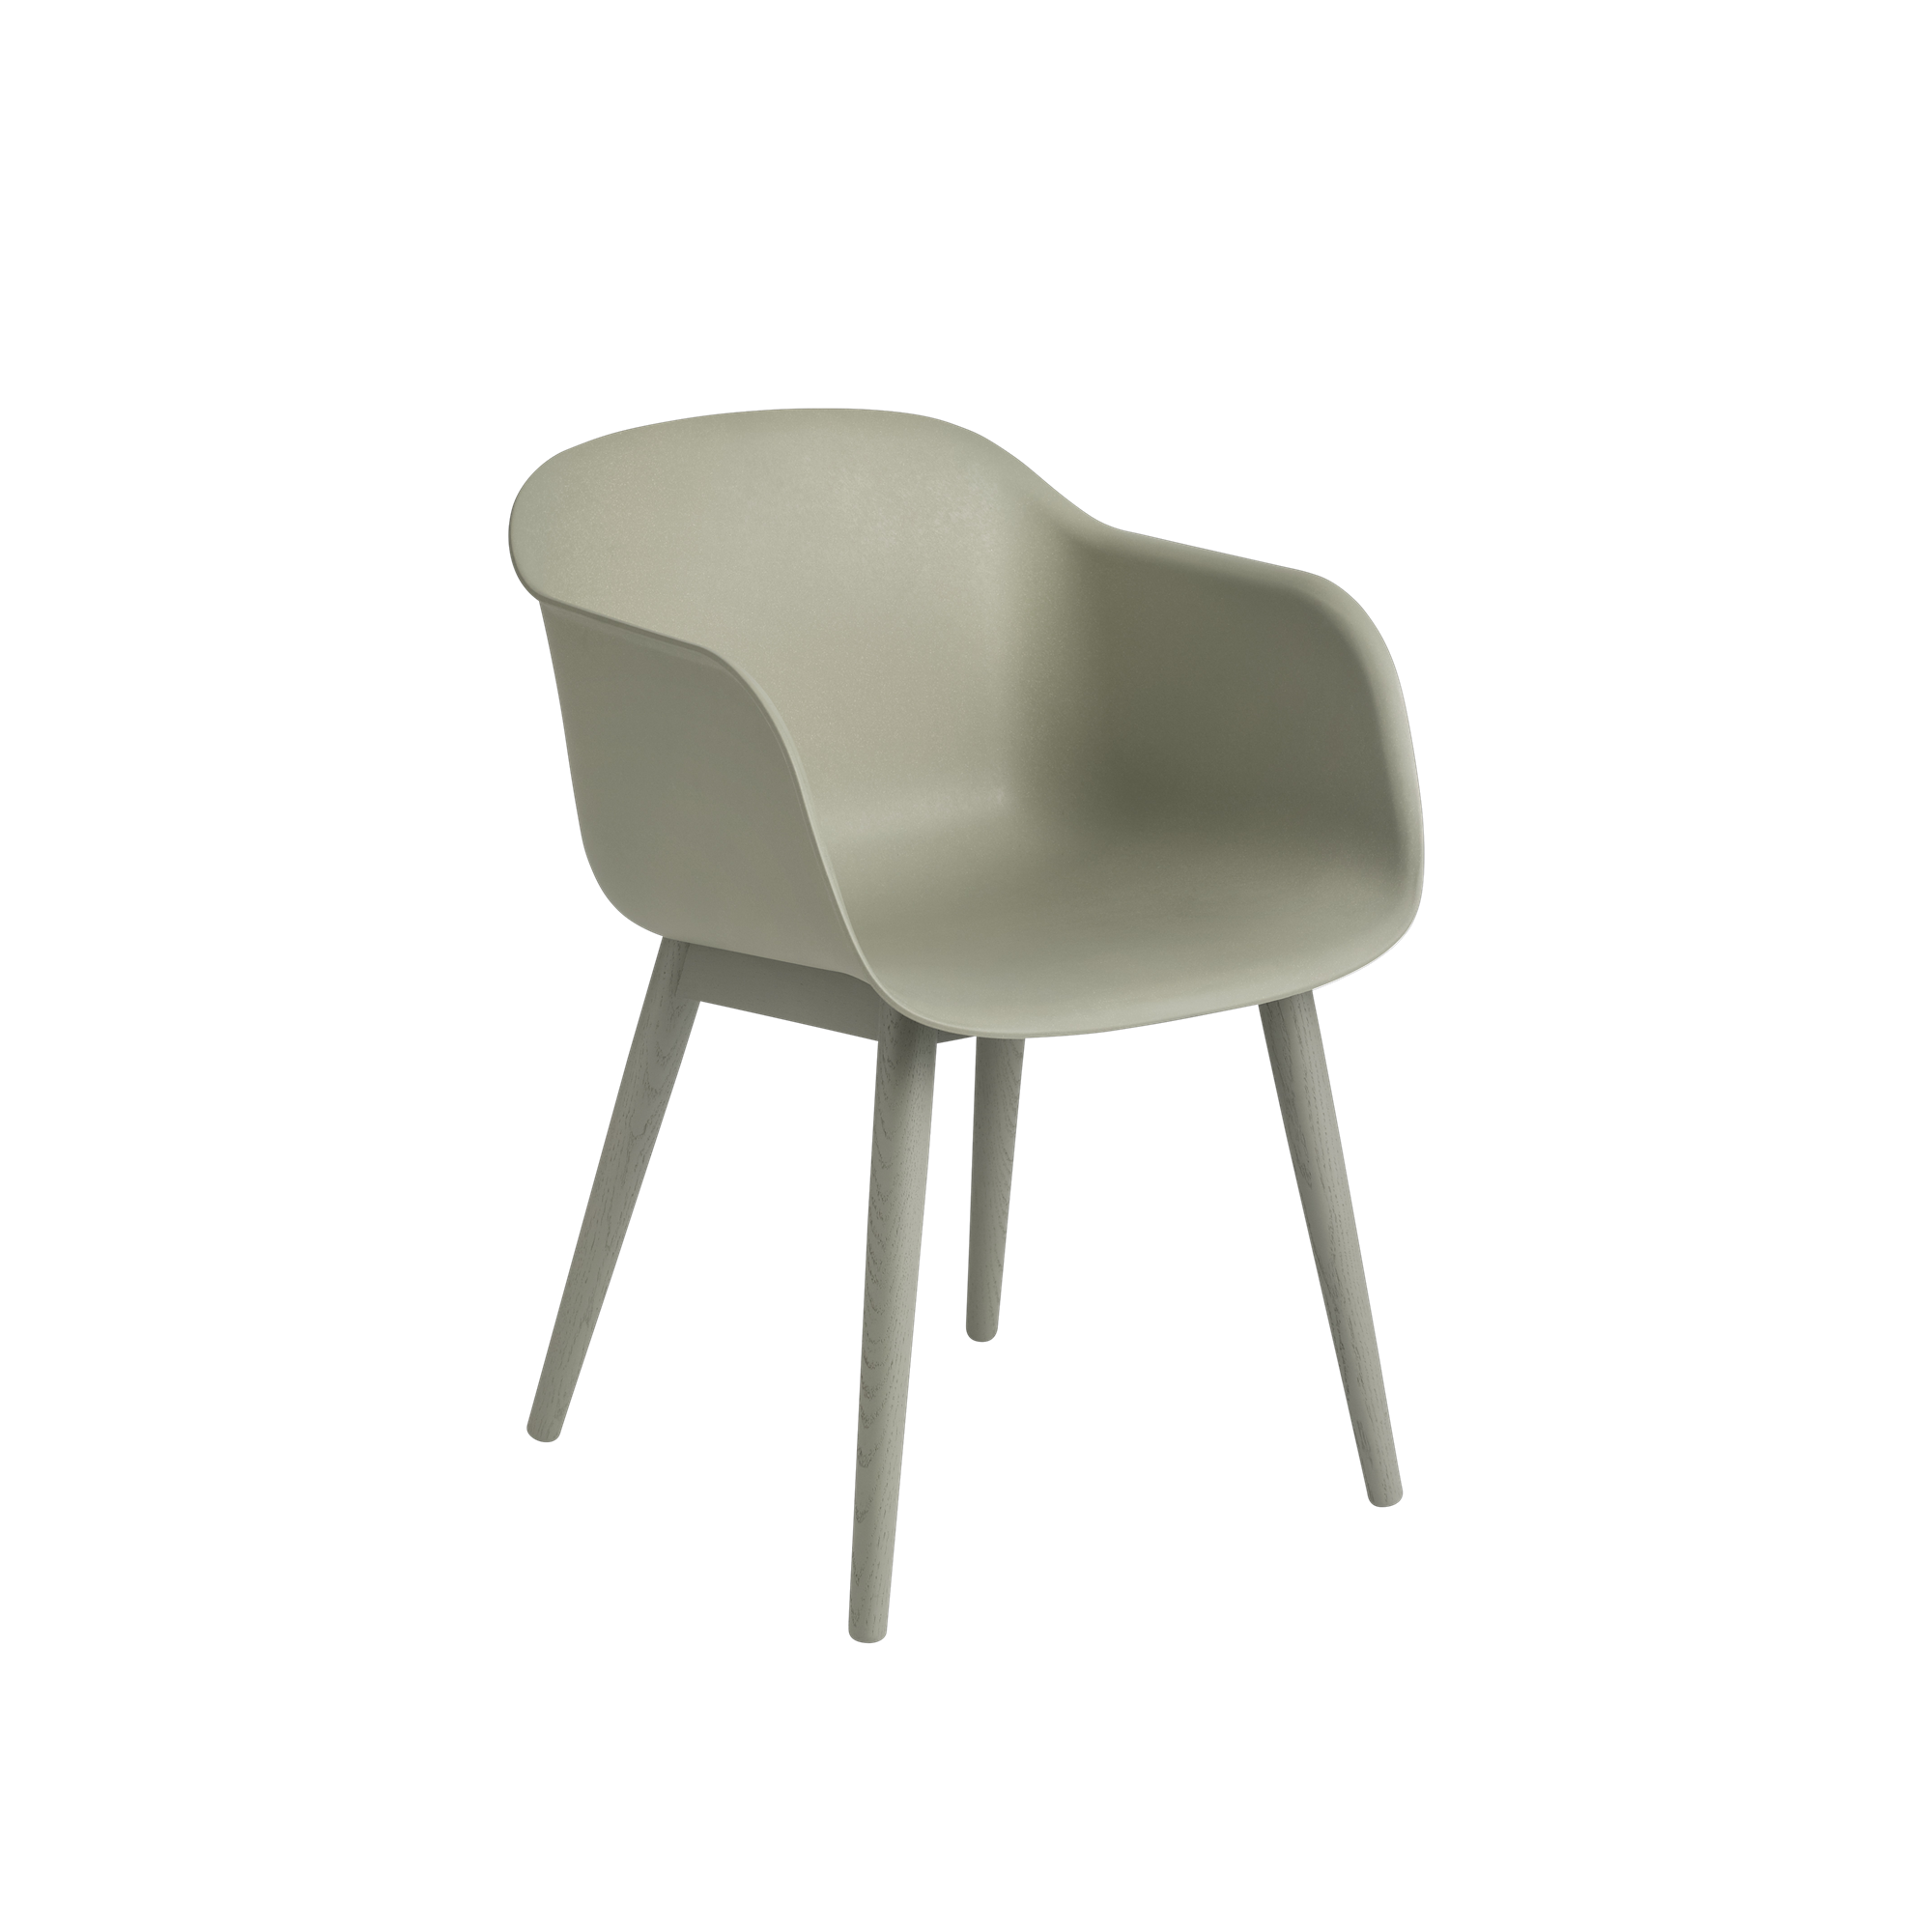 fiber-armchair-wood-base-master-fiber-armchair-wood-base-1504618165-9369440.png